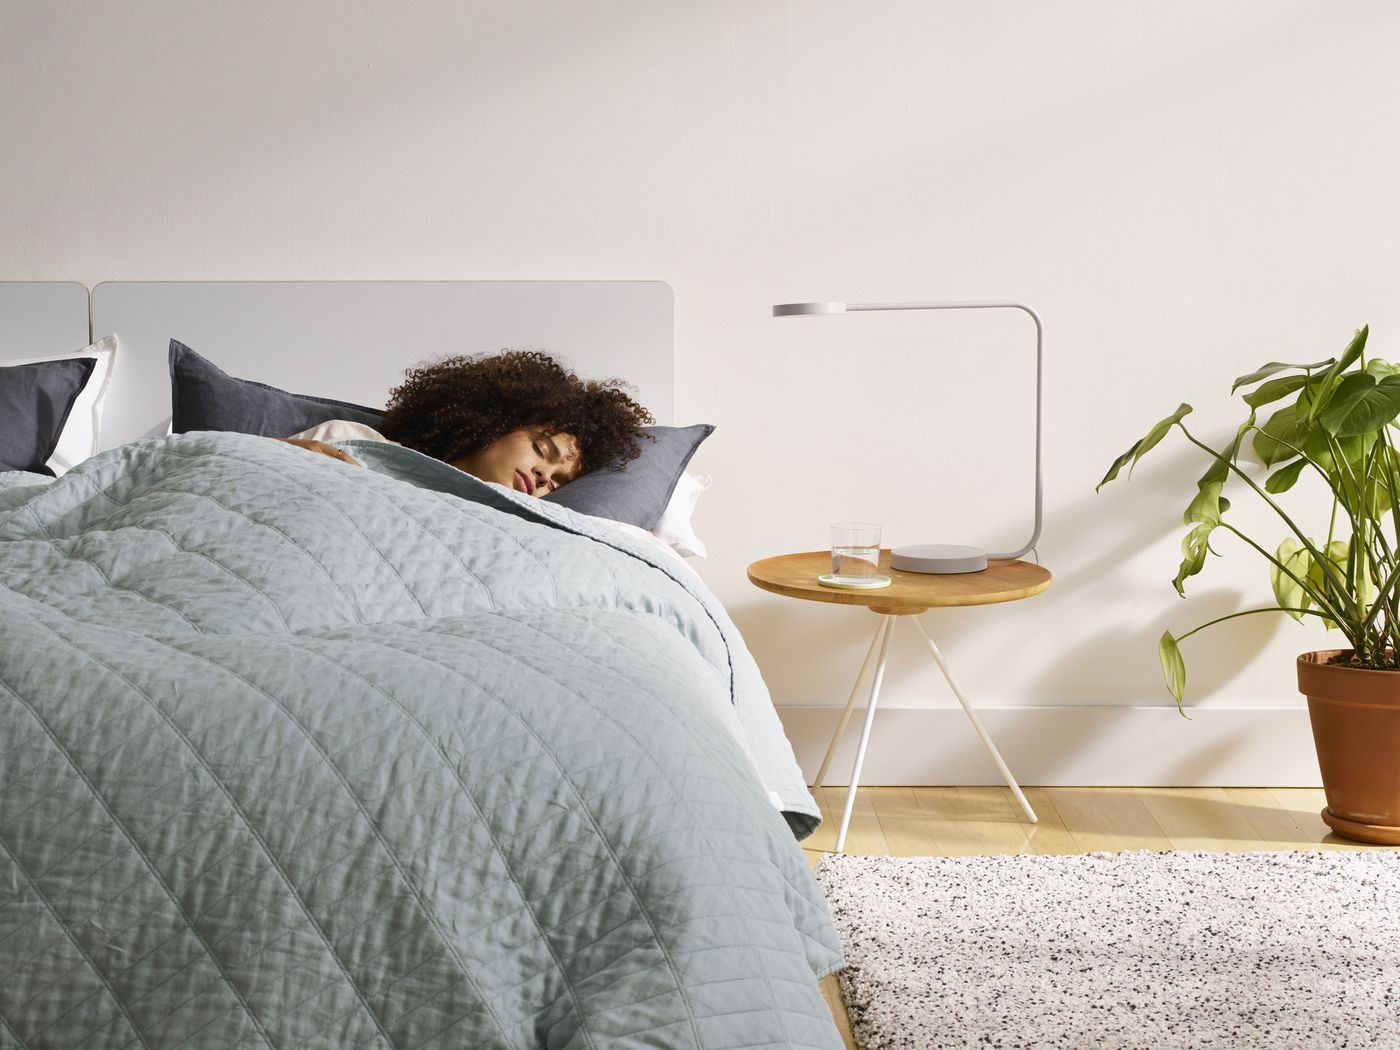 Upscale Pajamas Luxury Bedding